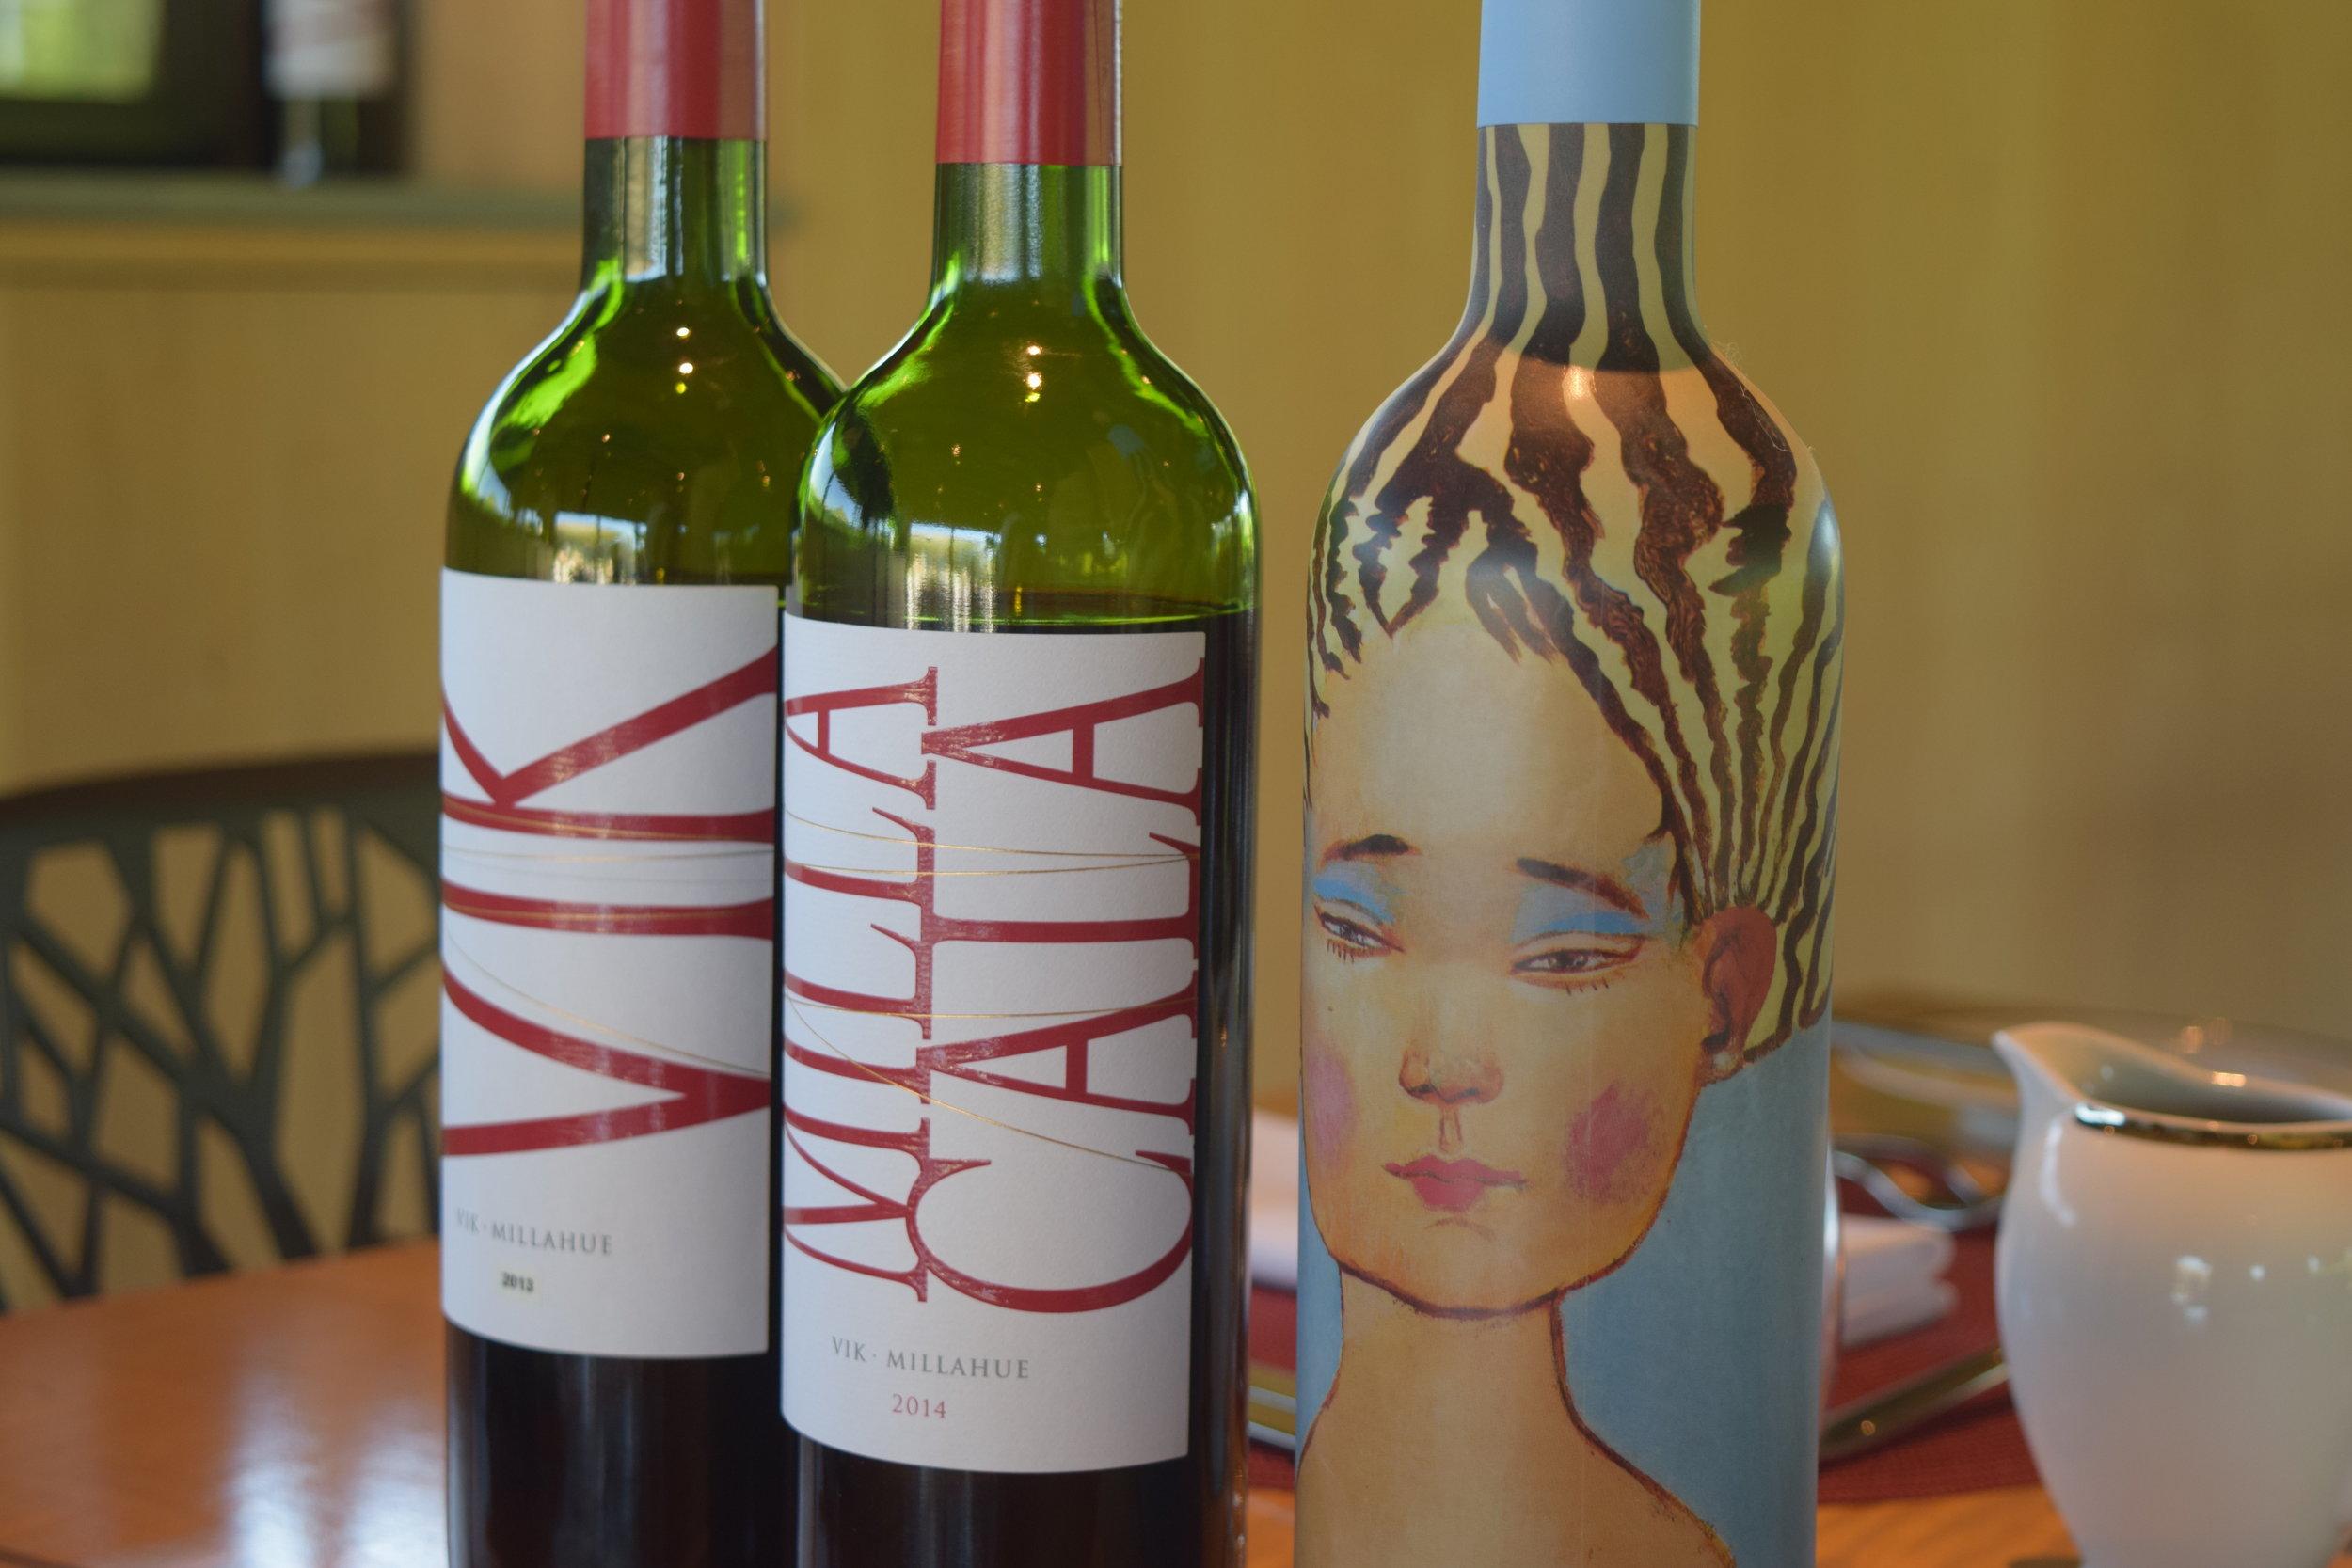 Vina Vik's three wines, VIK, Milla Cala, and La Piu Belle